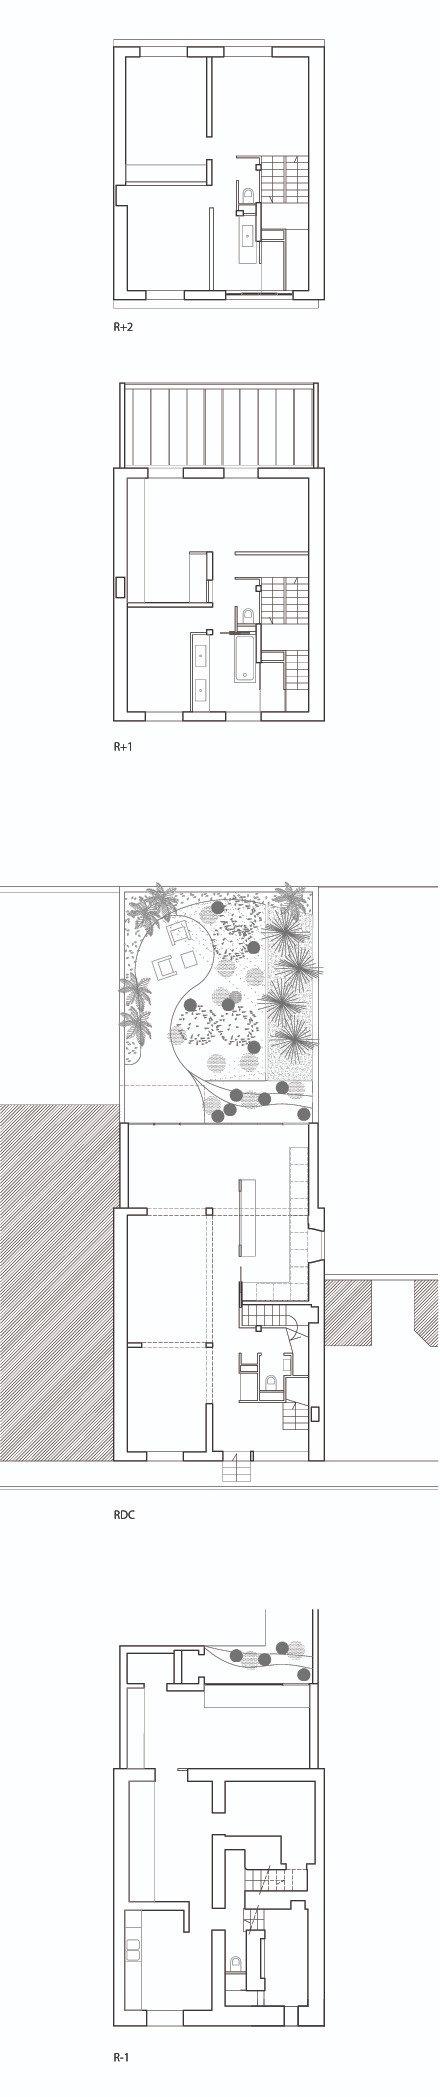 Plans_MaisonD_AJAP_Projet_edited.jpg